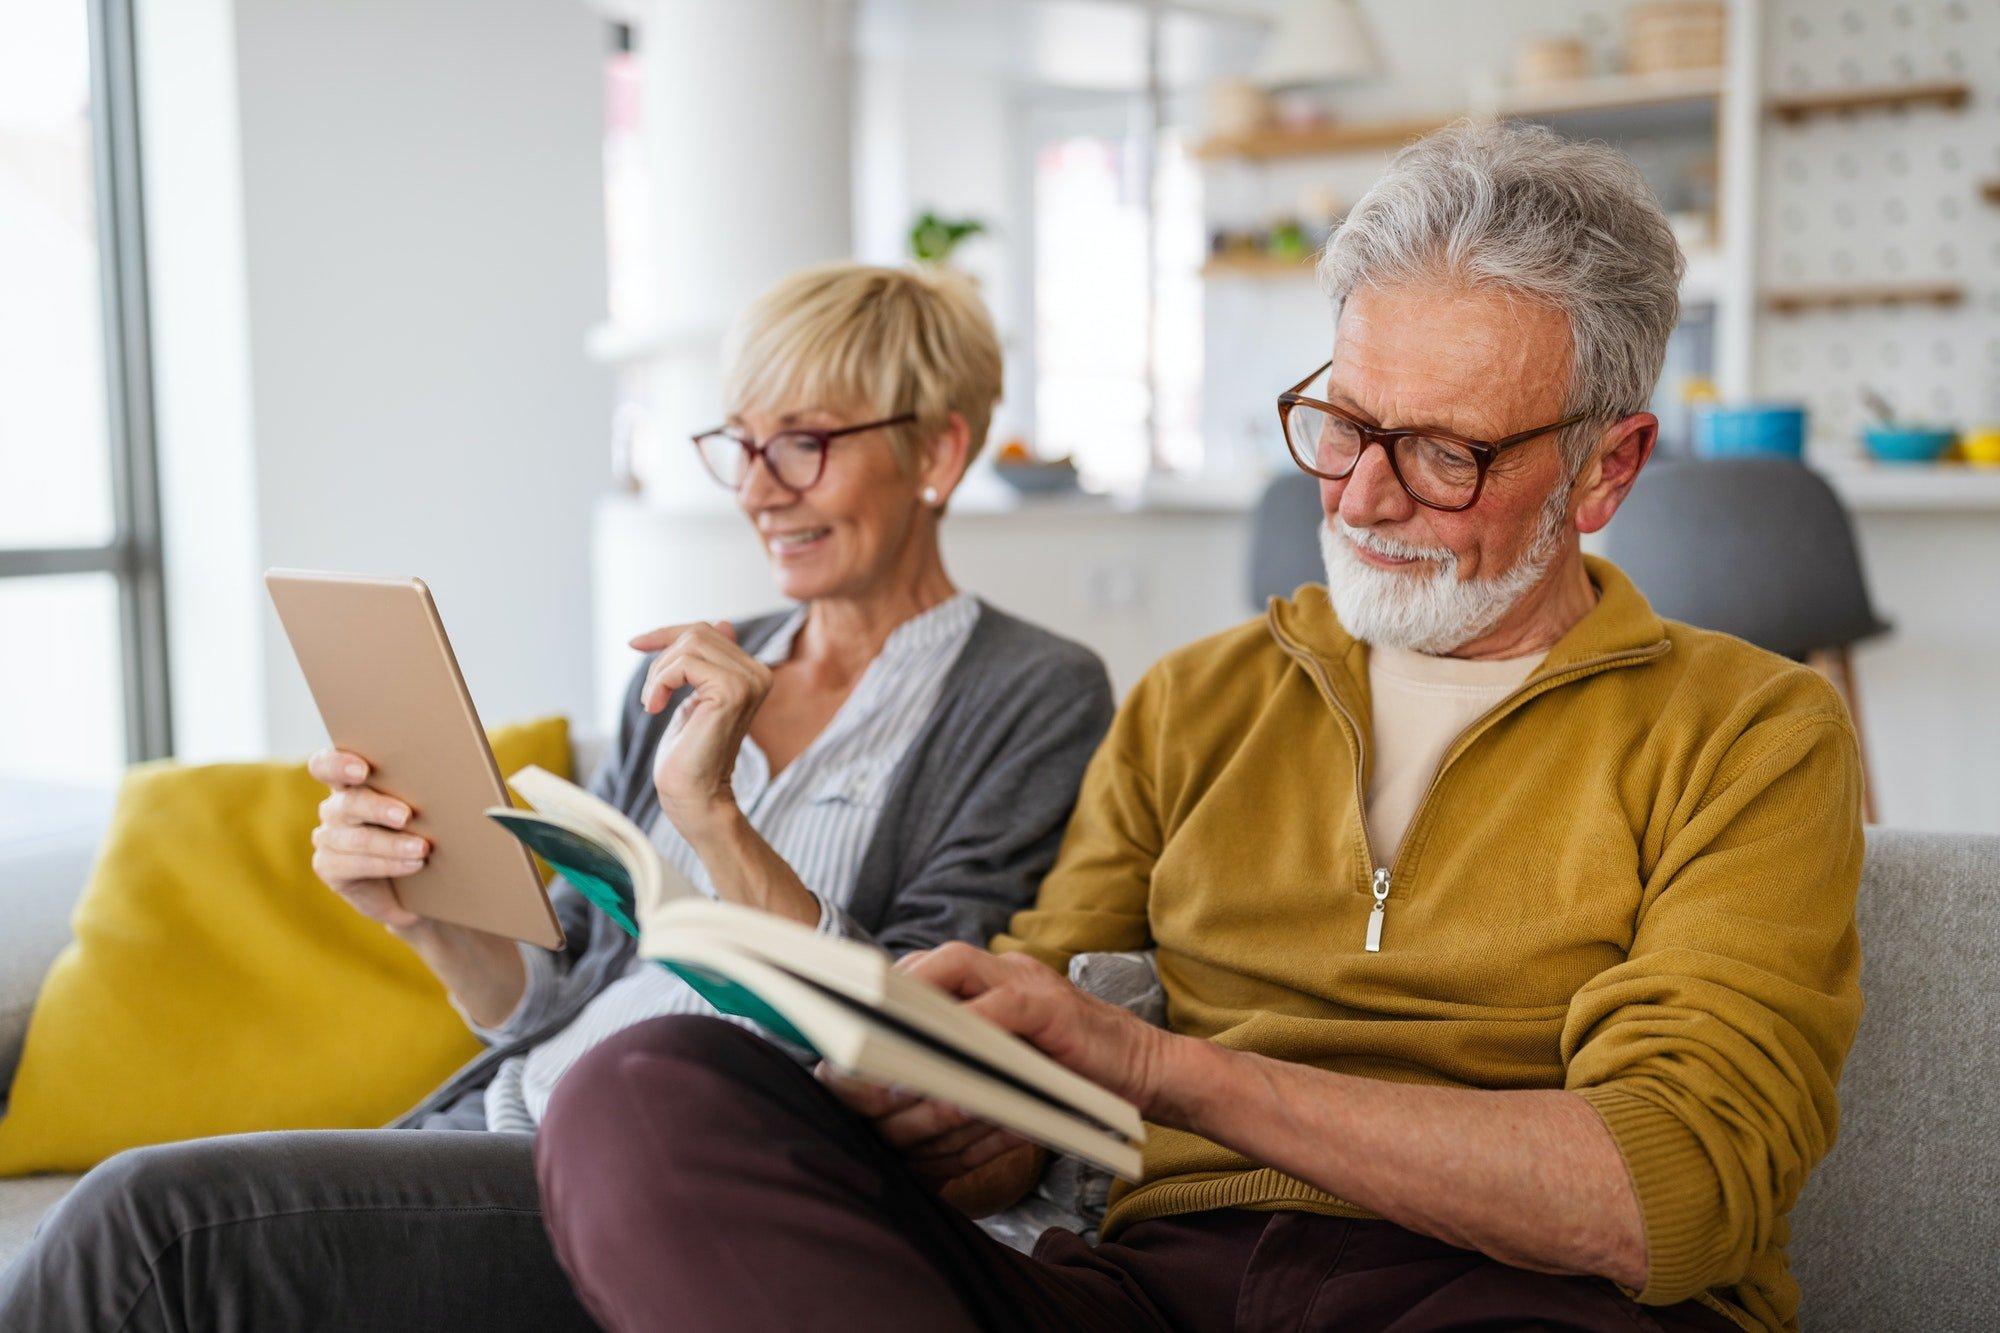 Cheerful senior couple enjoying retired life at home